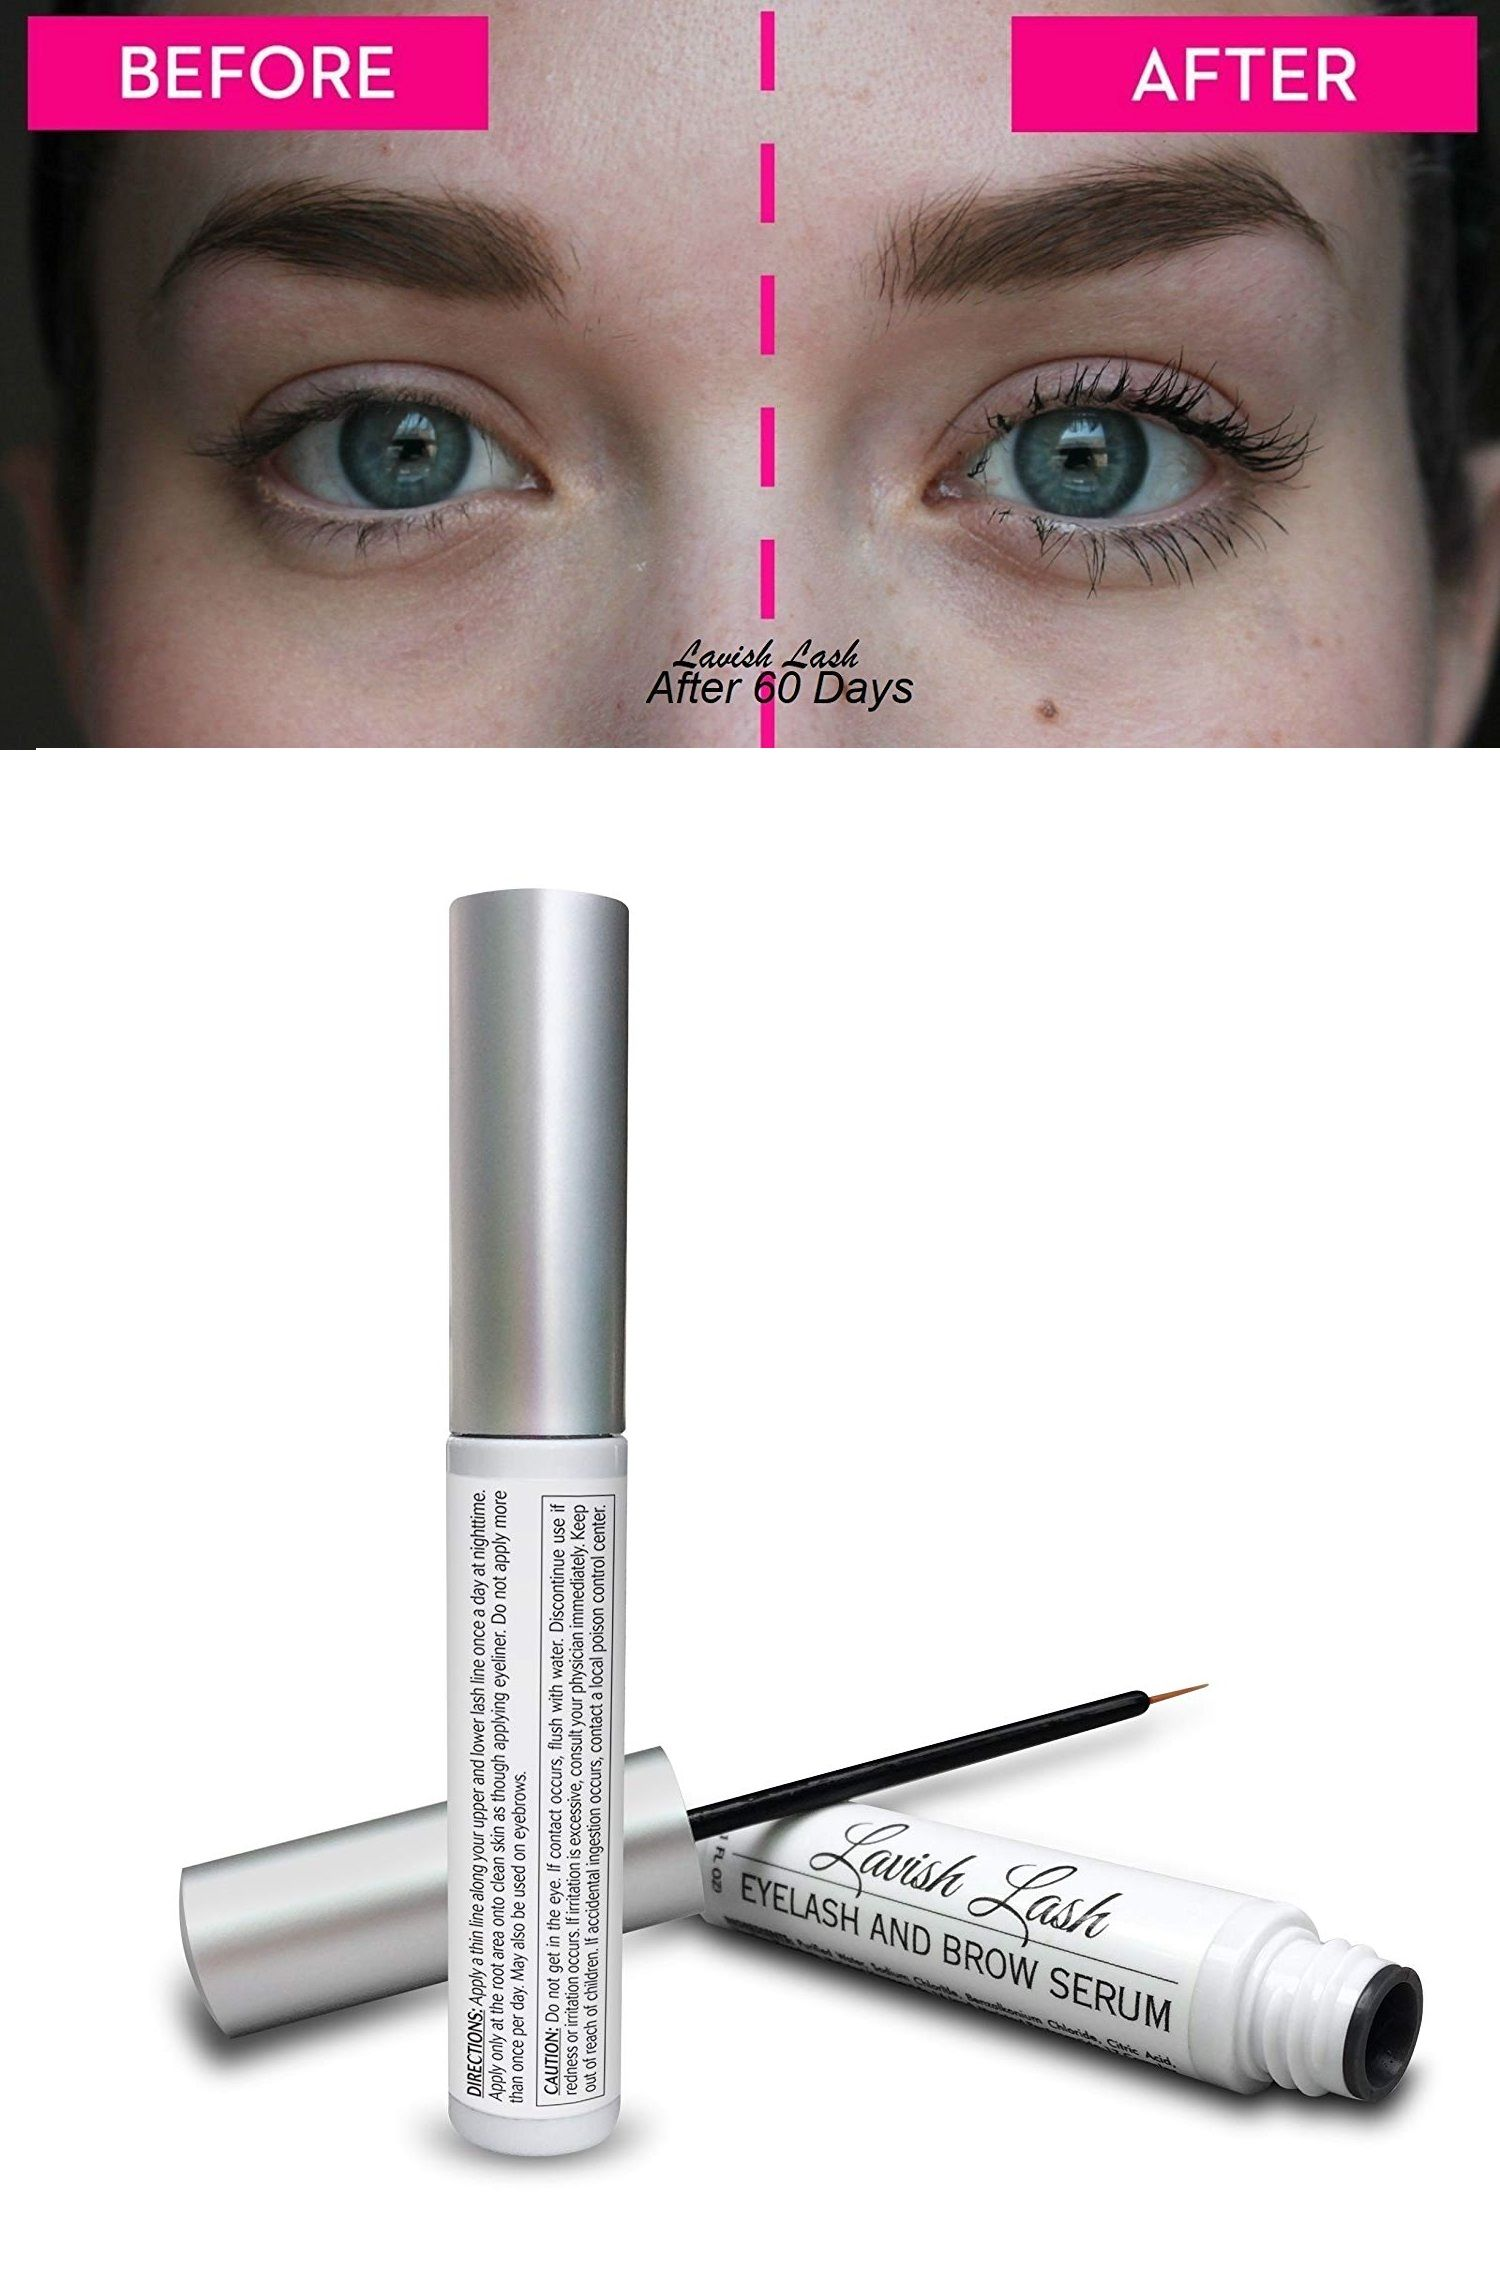 24fc3aeb8b8 Hairgenics Lavish Lash – Eyelash Growth Enhancer & Brow Serum for Long,  Luscious Lashes